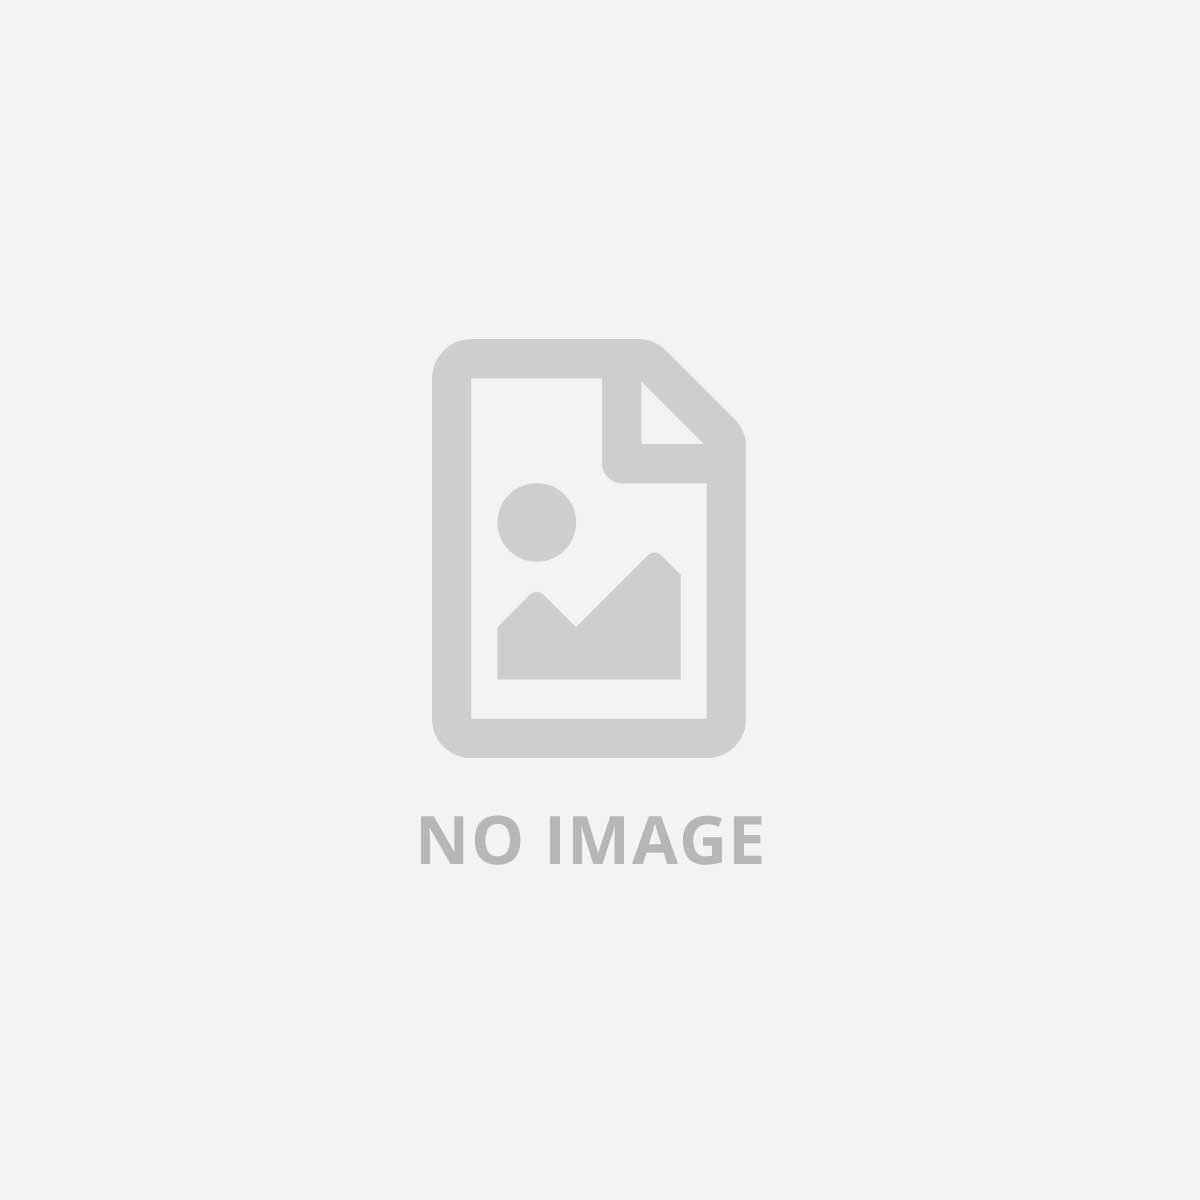 VERBATIM 128GB SATA3 2.5 SSD 7MM  VI550